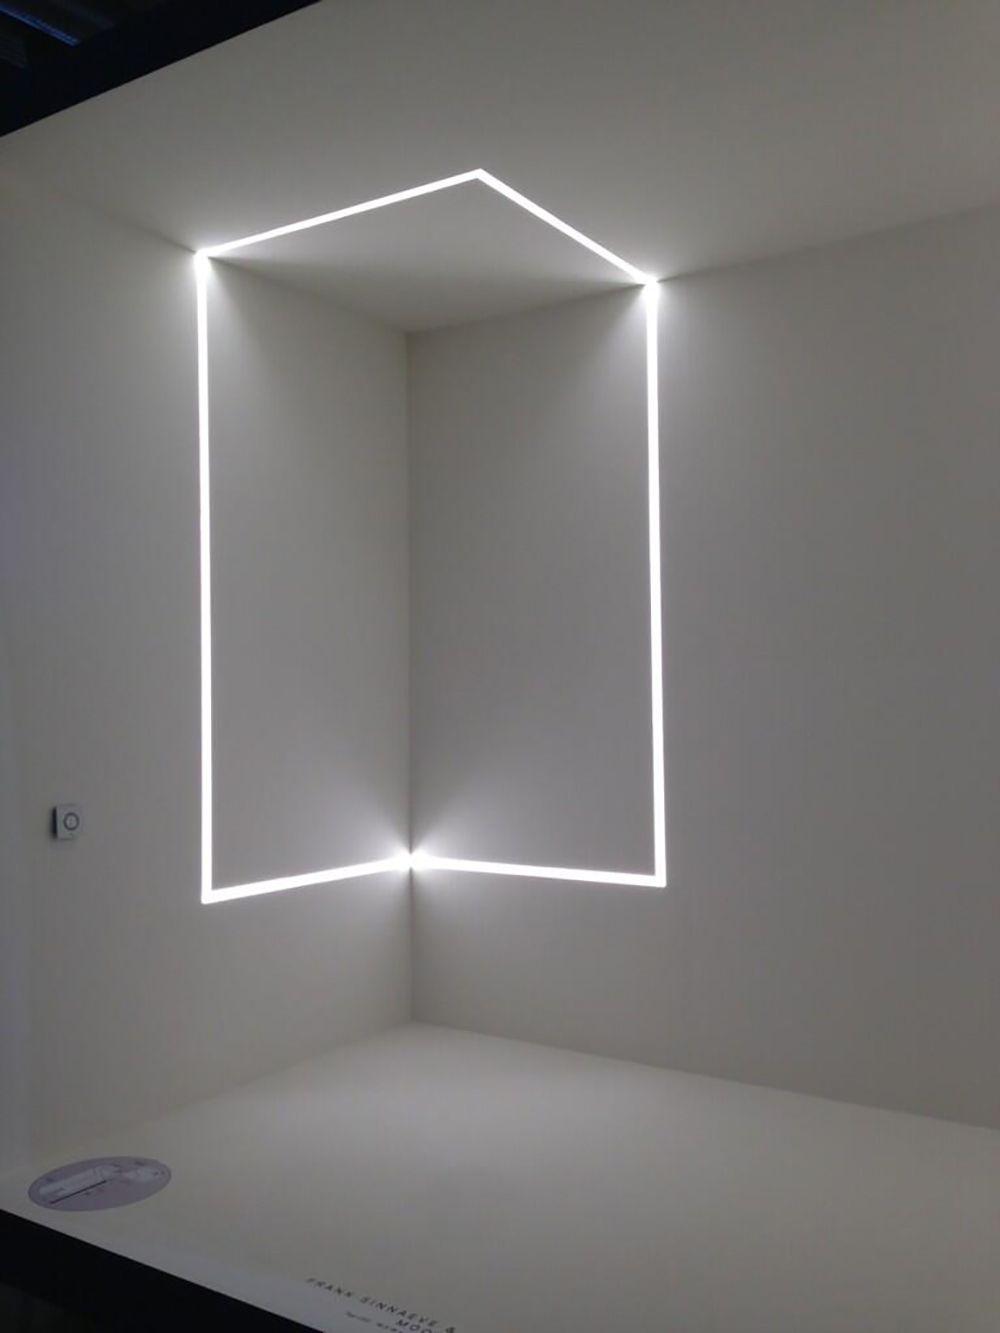 Ideas de decoraci n e iluminaci n con tiras de leds - Iluminacion exterior led ...